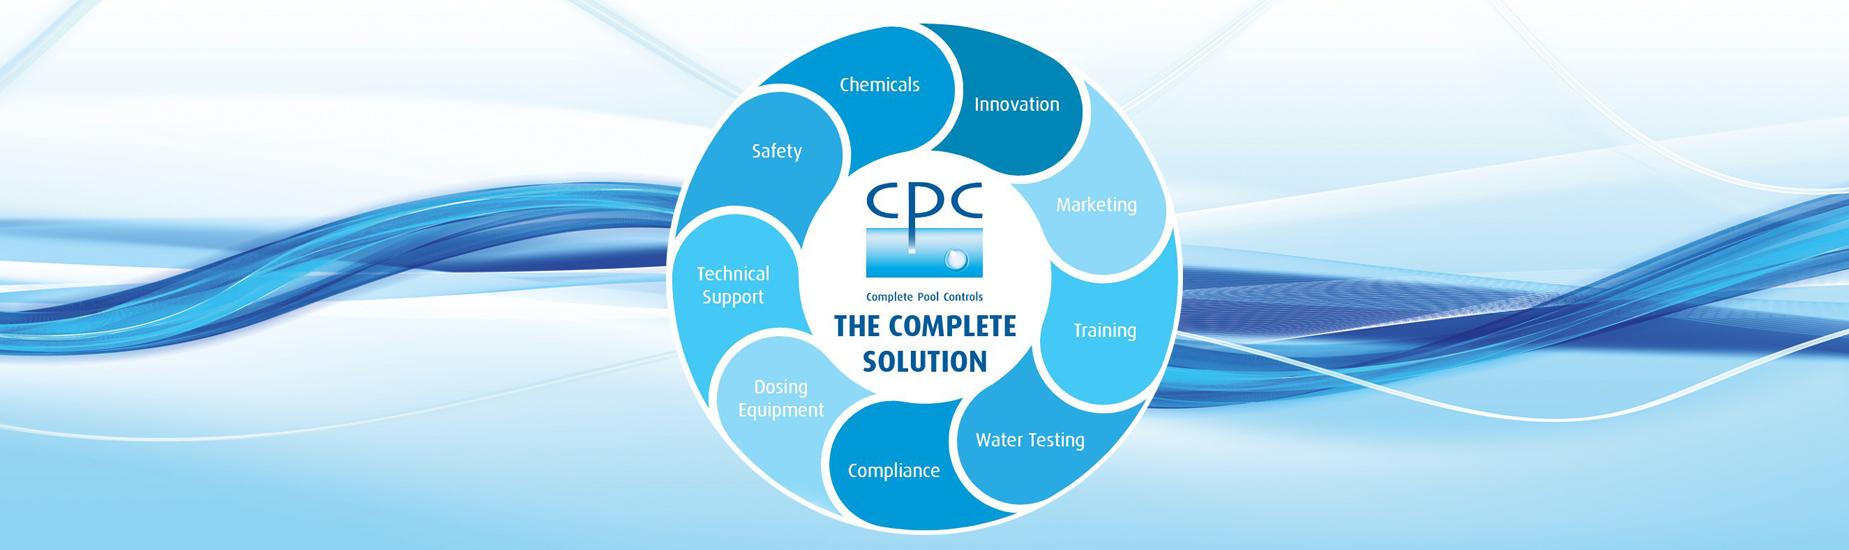 CPC_SolutionGraphic